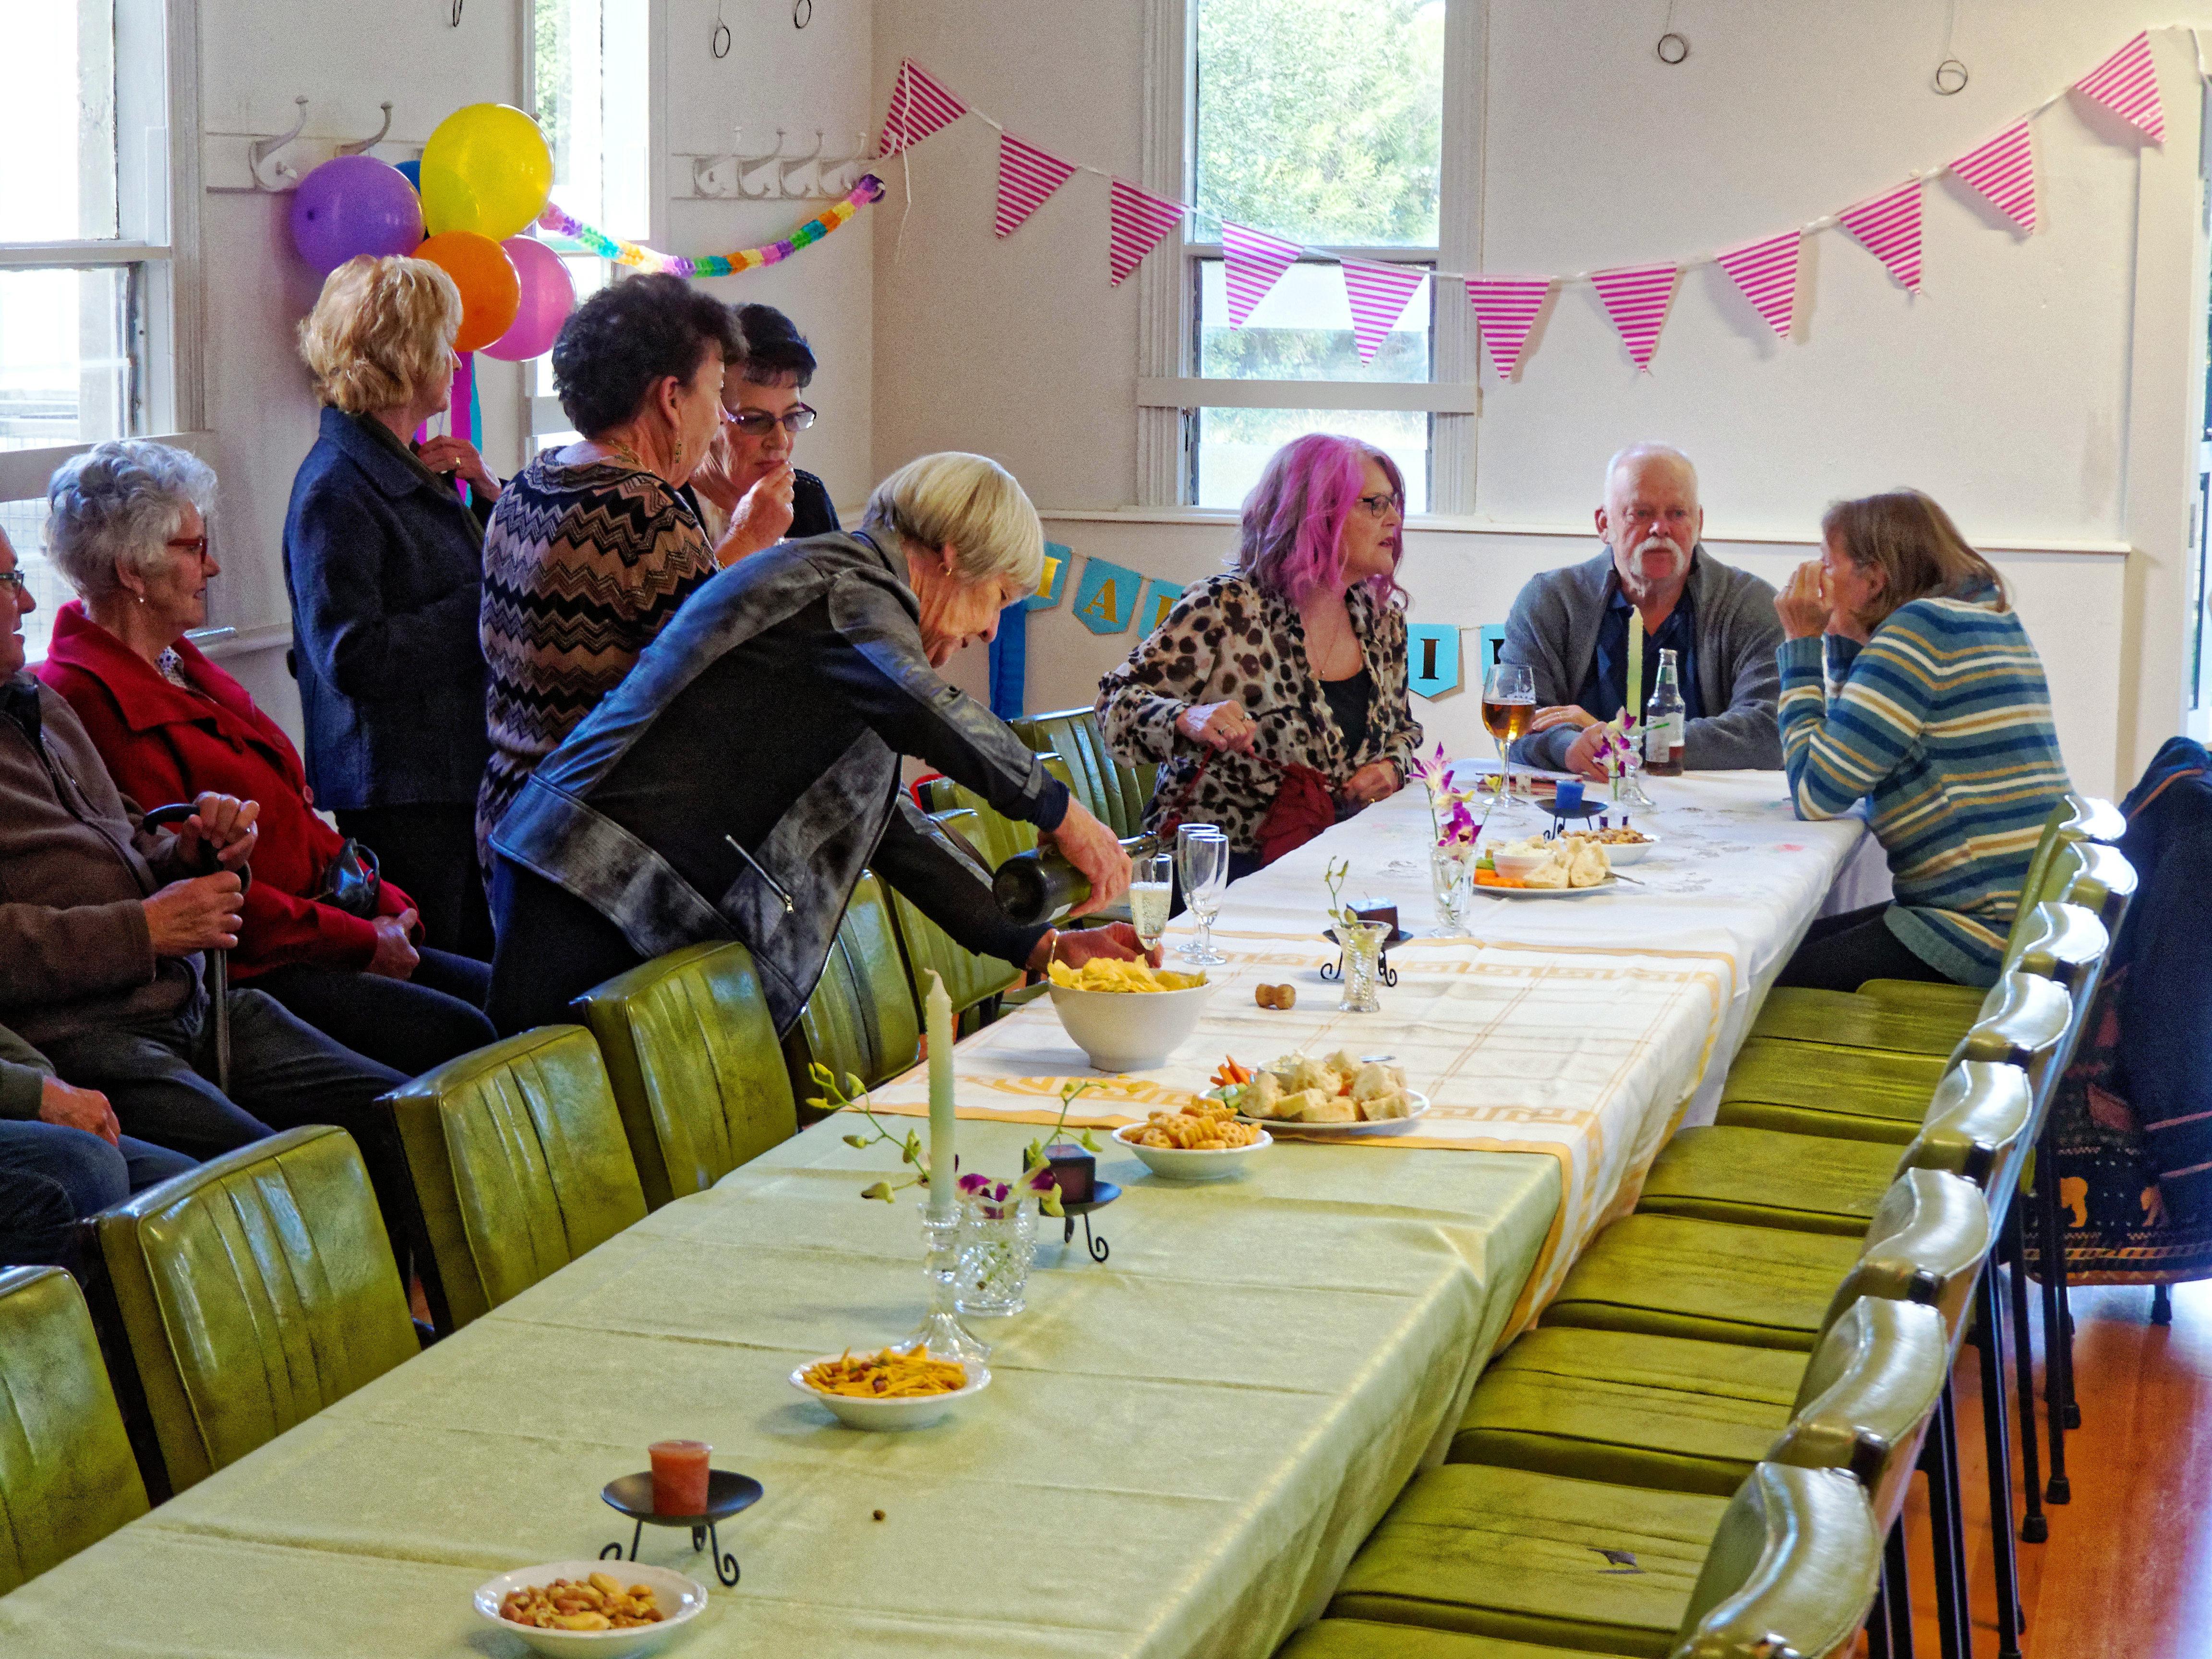 70th-birthday-party-3.jpeg